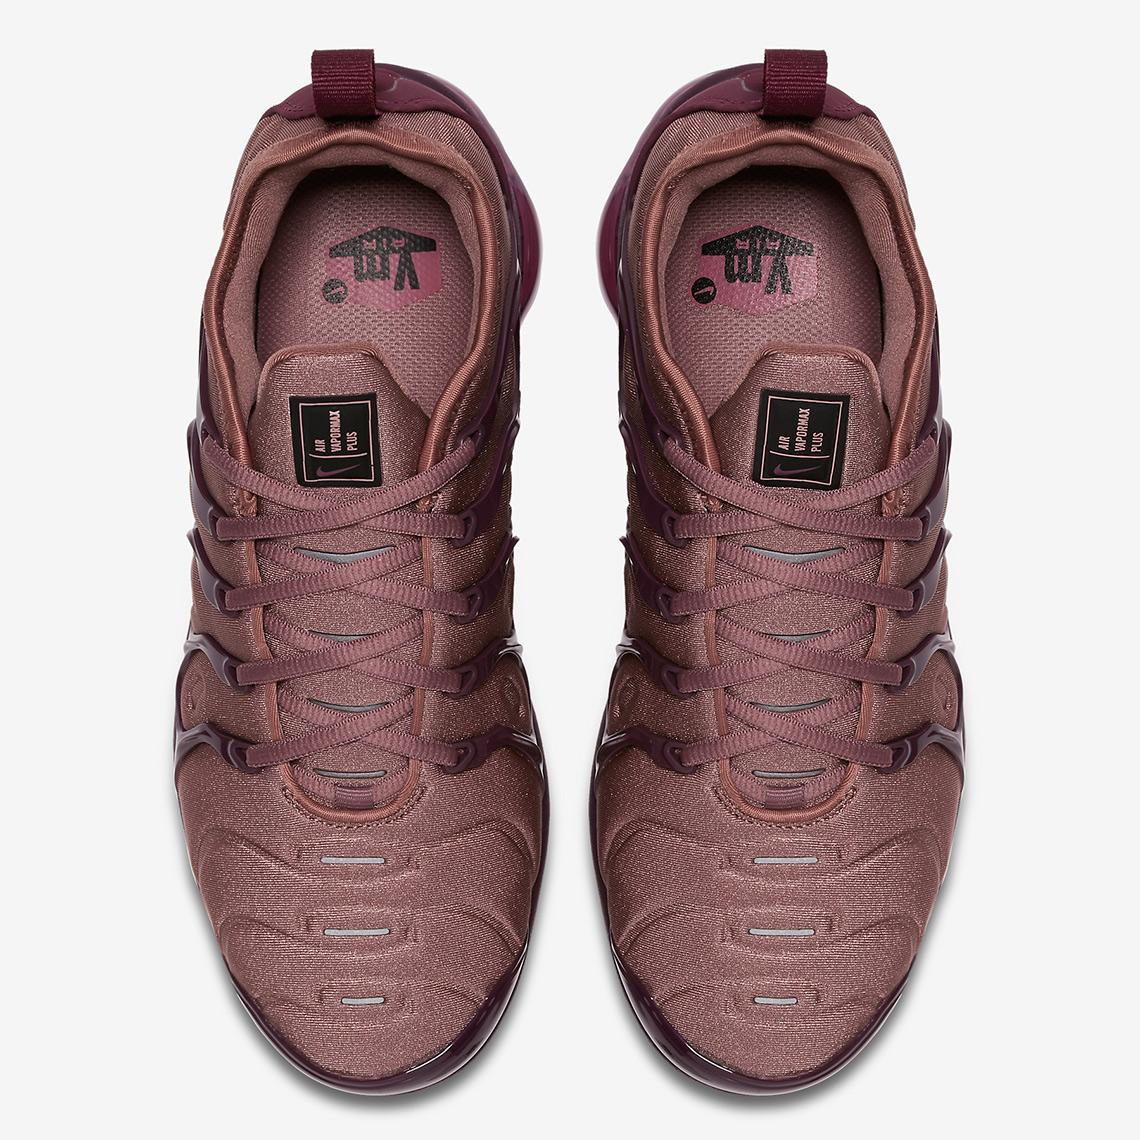 burgundy vapormax plus women's